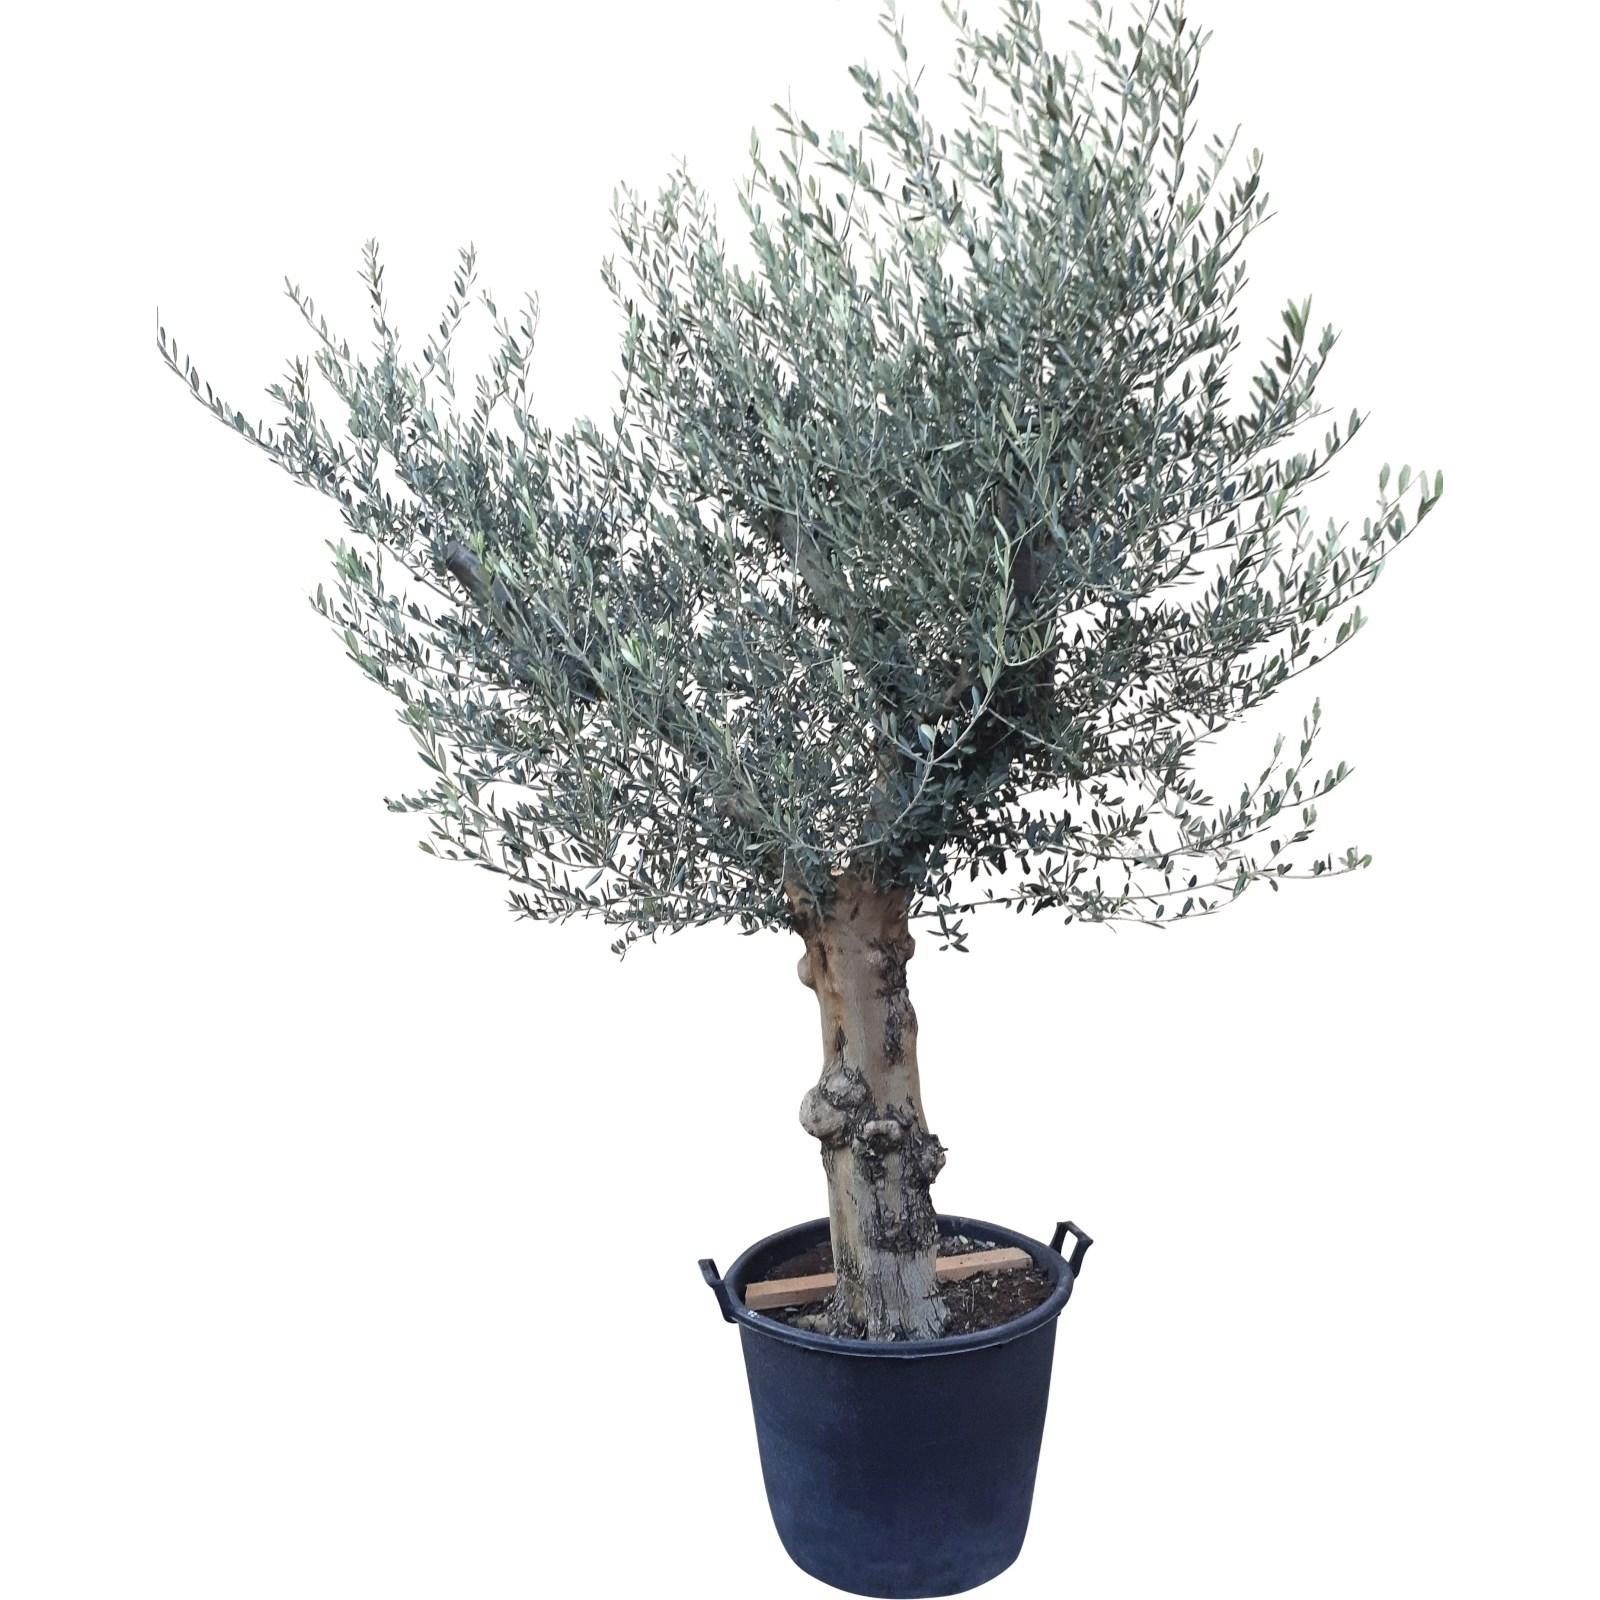 Extrem Olivenbaum XL P160 l - Mediterrane Pflanzen - LANDI MN25